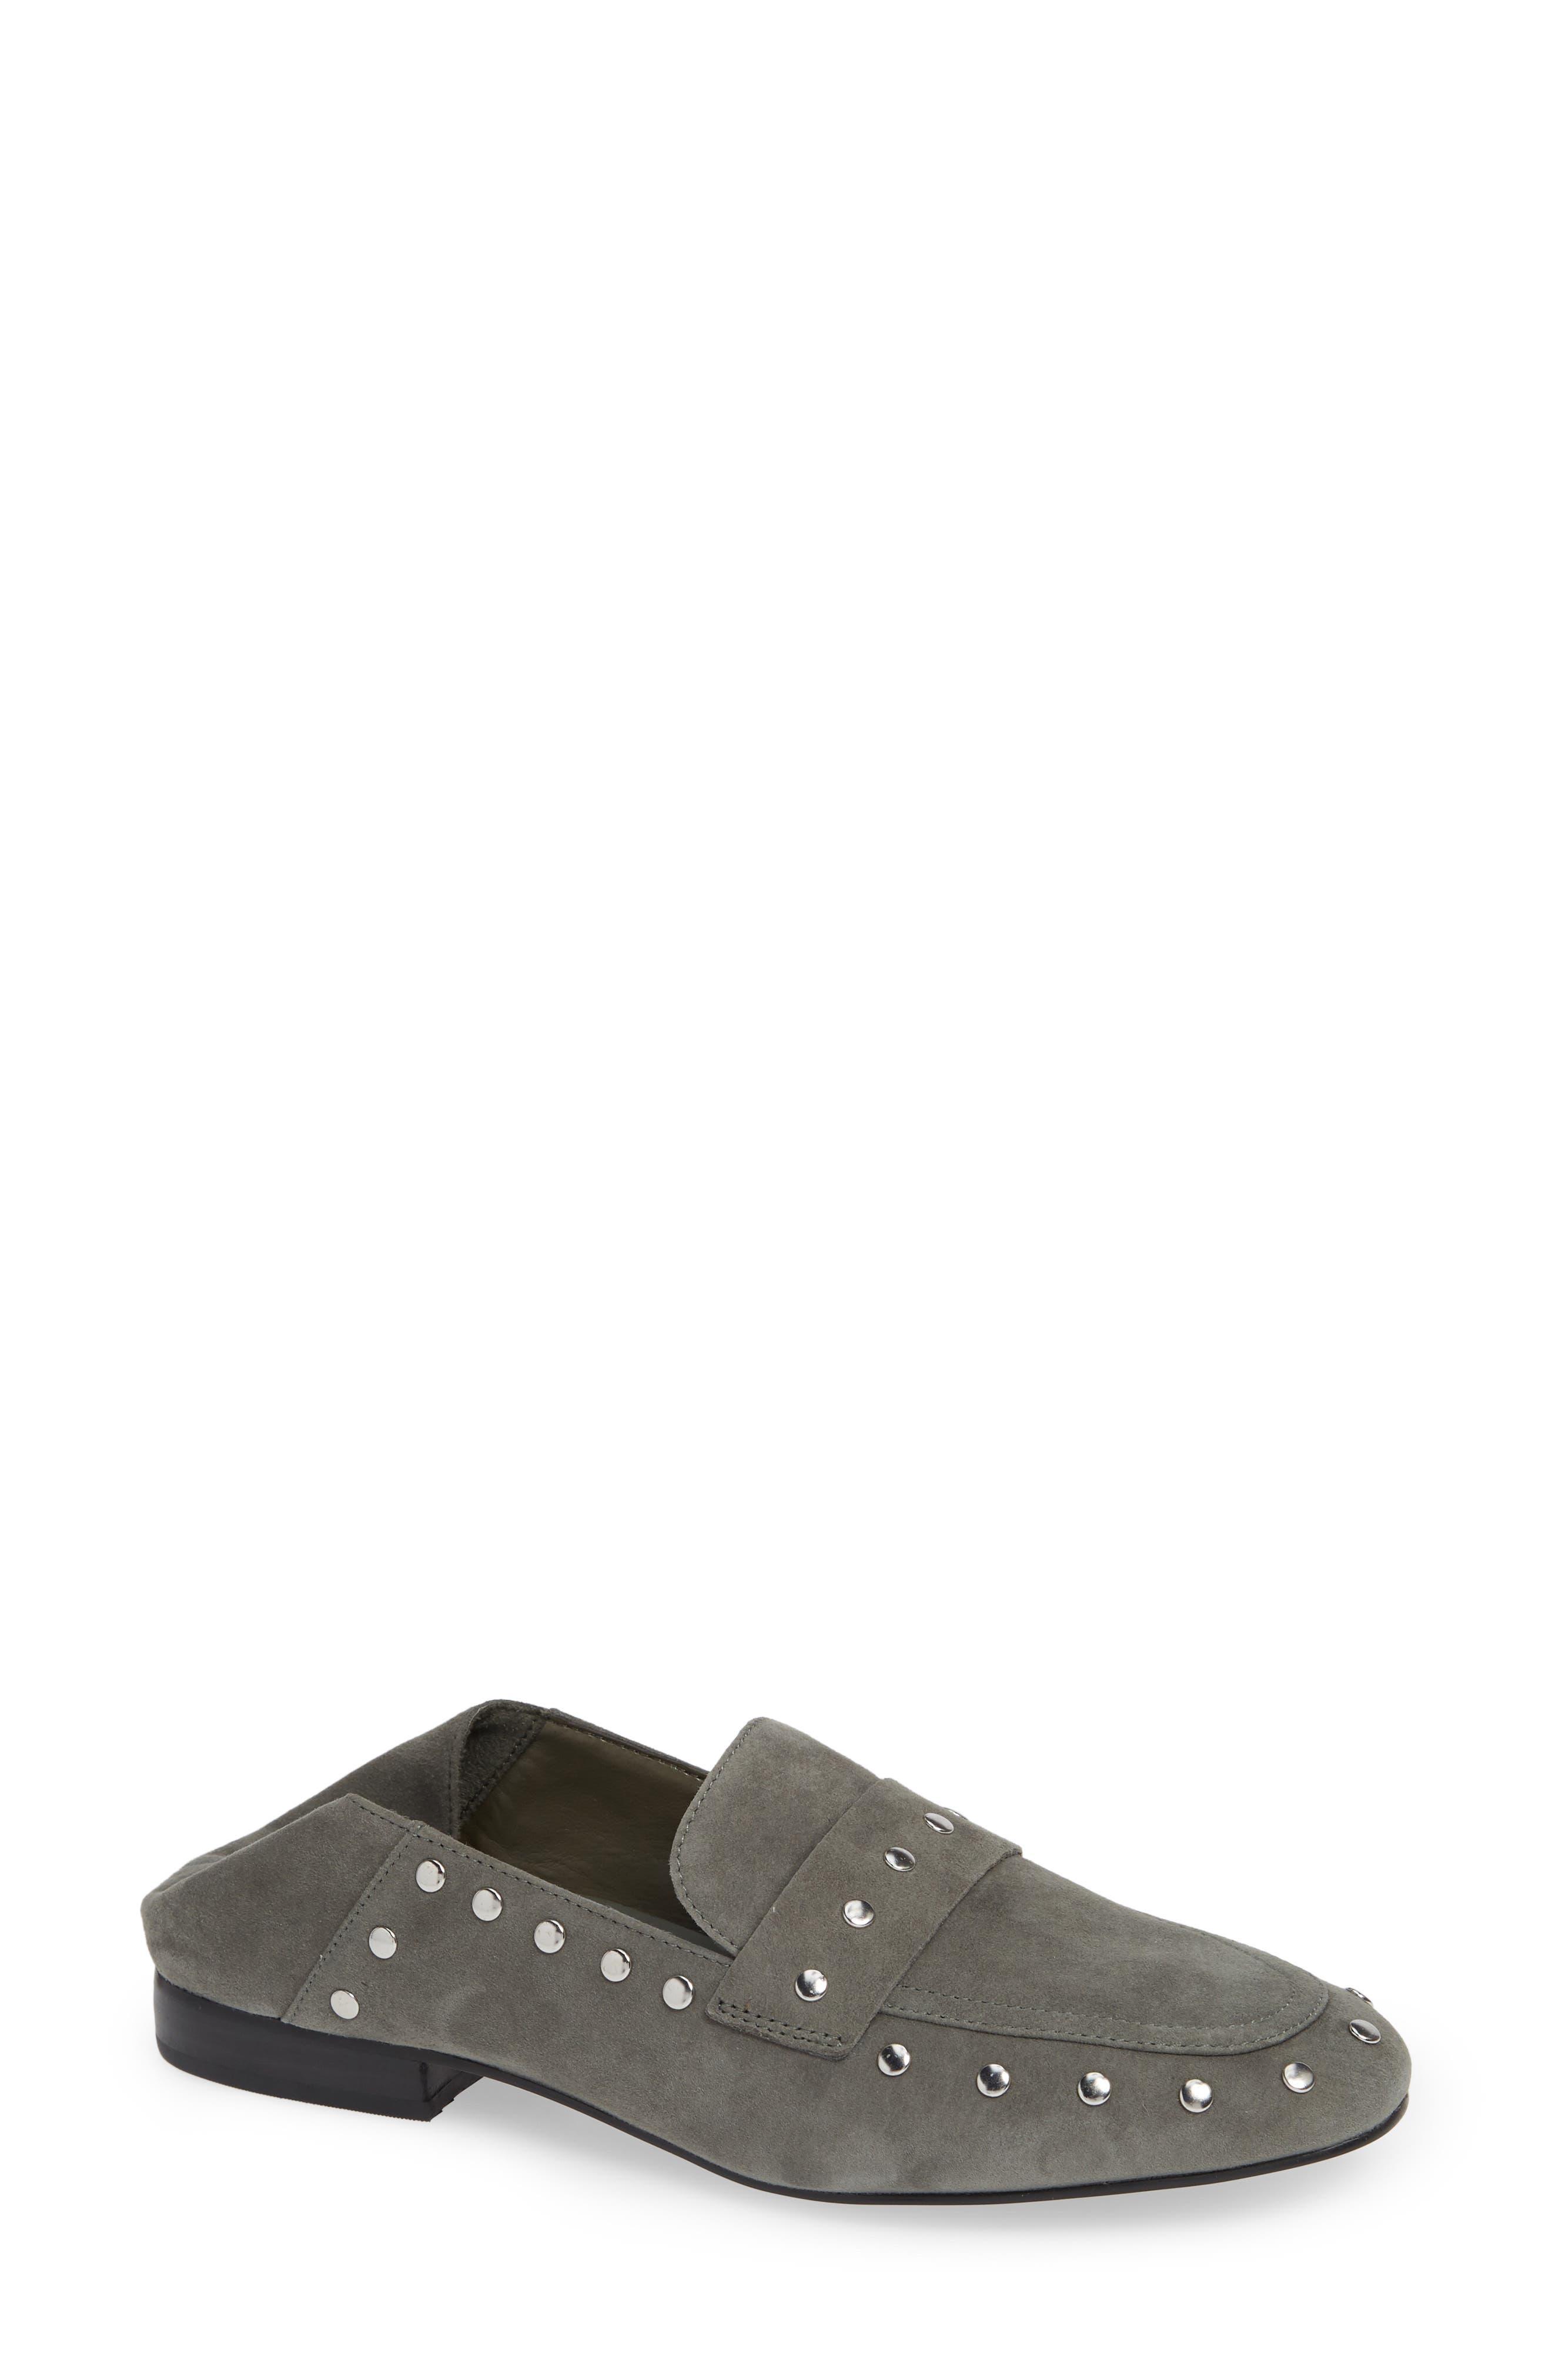 Black Suede Studio Alfee Studded Convertible Loafer